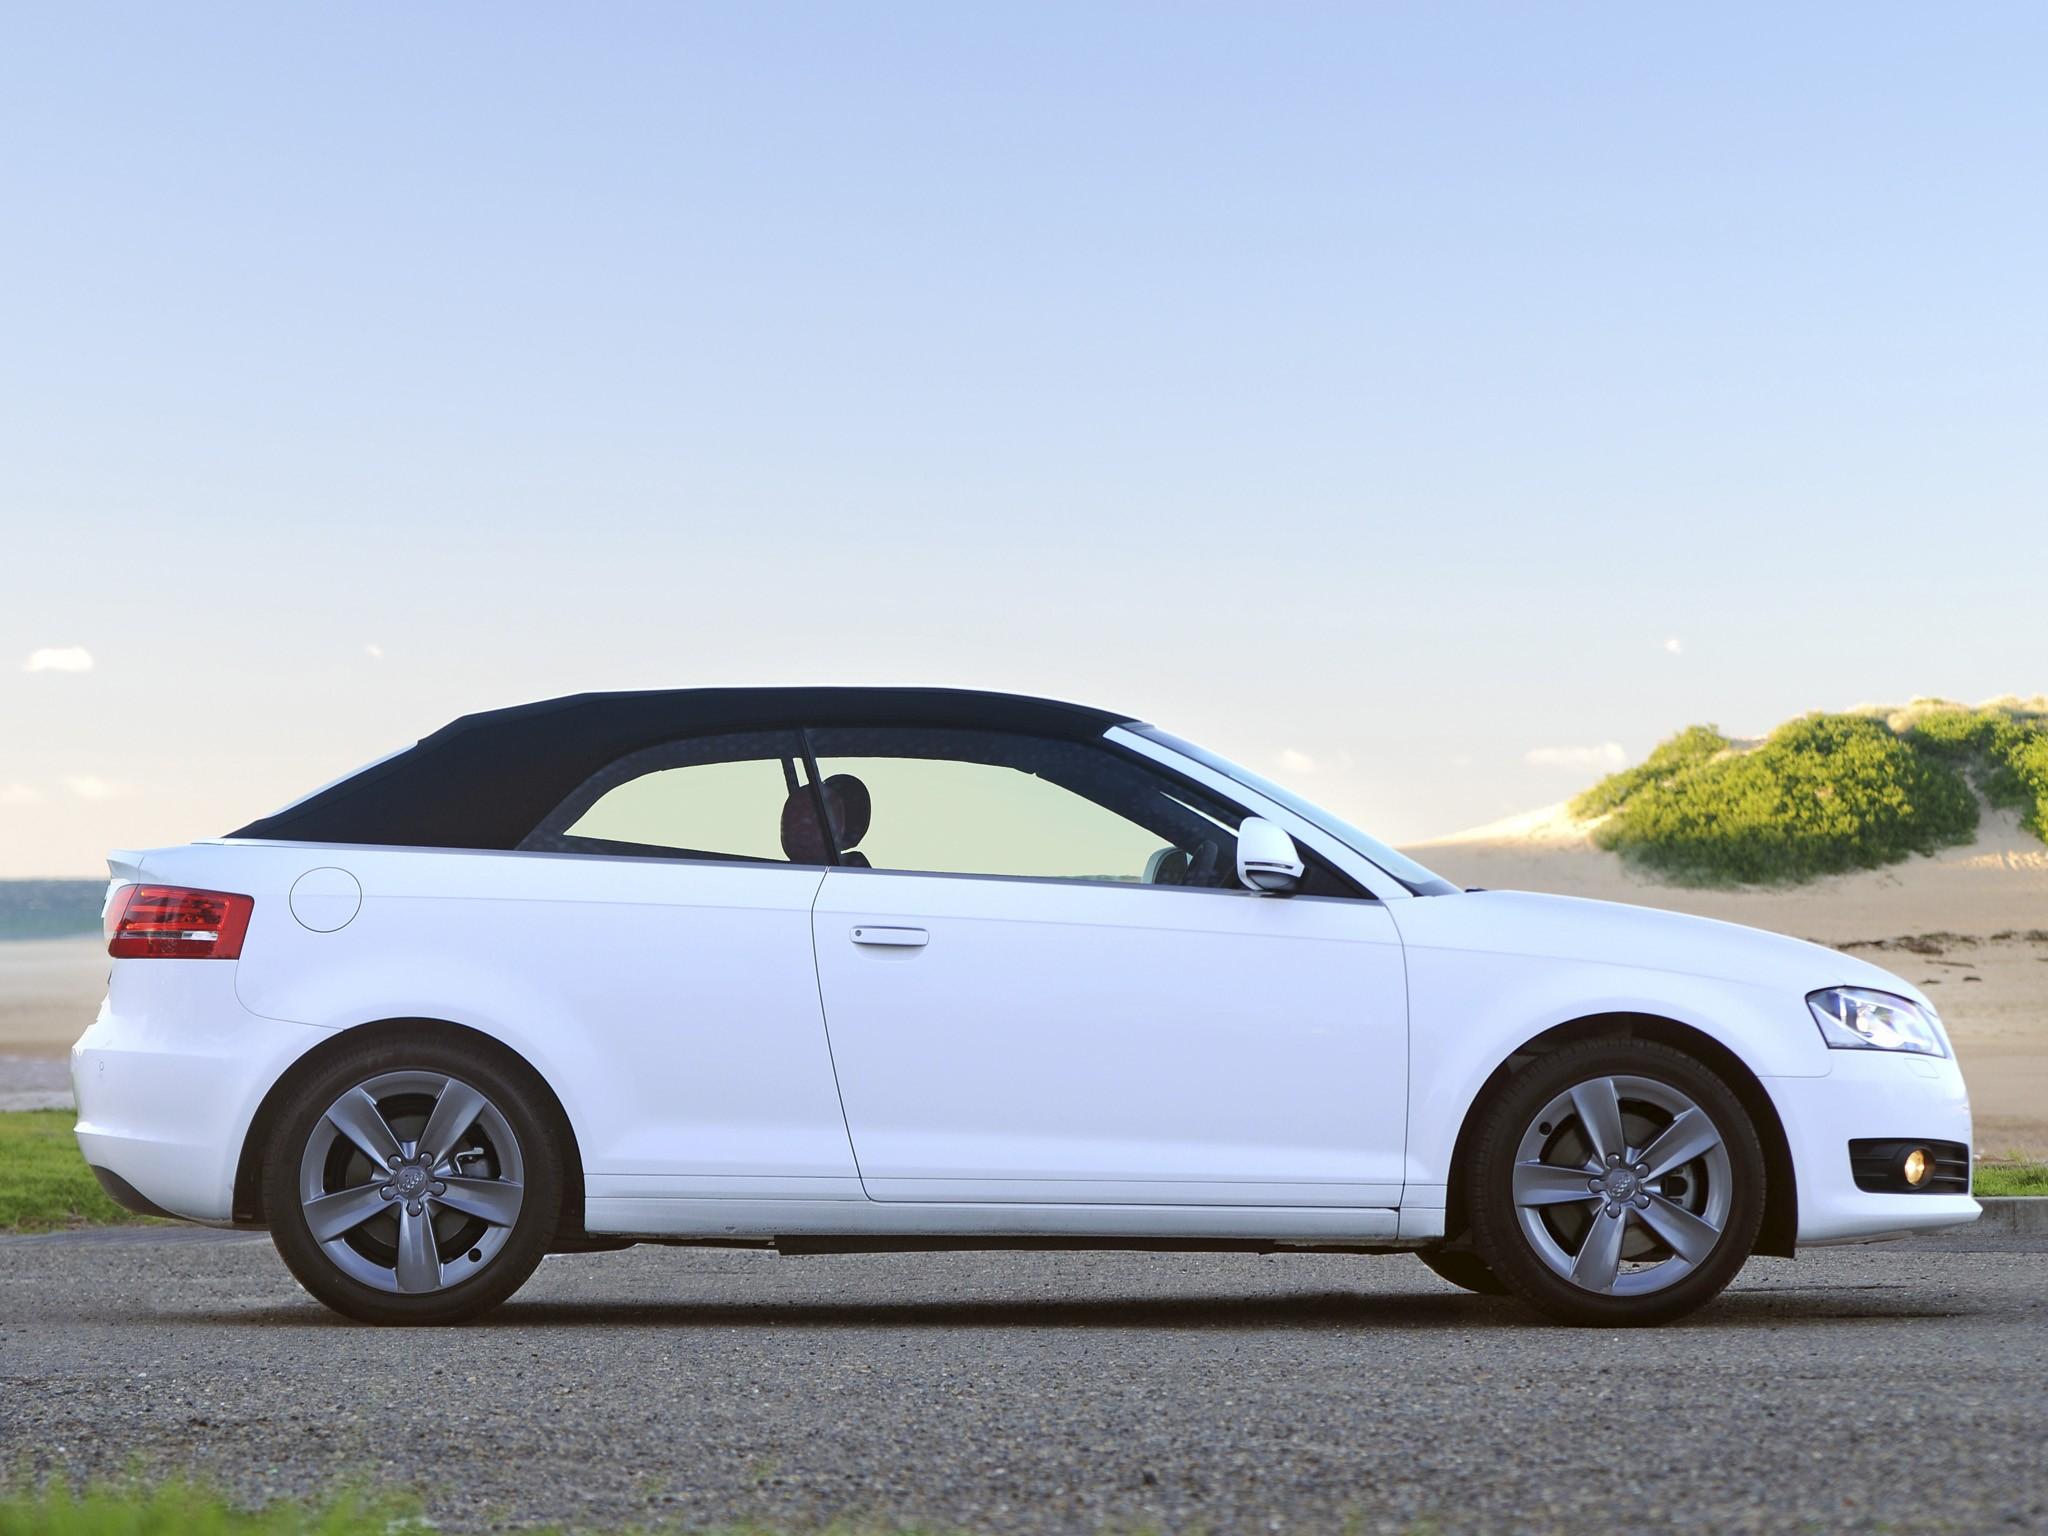 Audi A3 Cabriolet Specs Photos 2008 2009 2010 2011 2012 A5 Wiring Diagram 2013